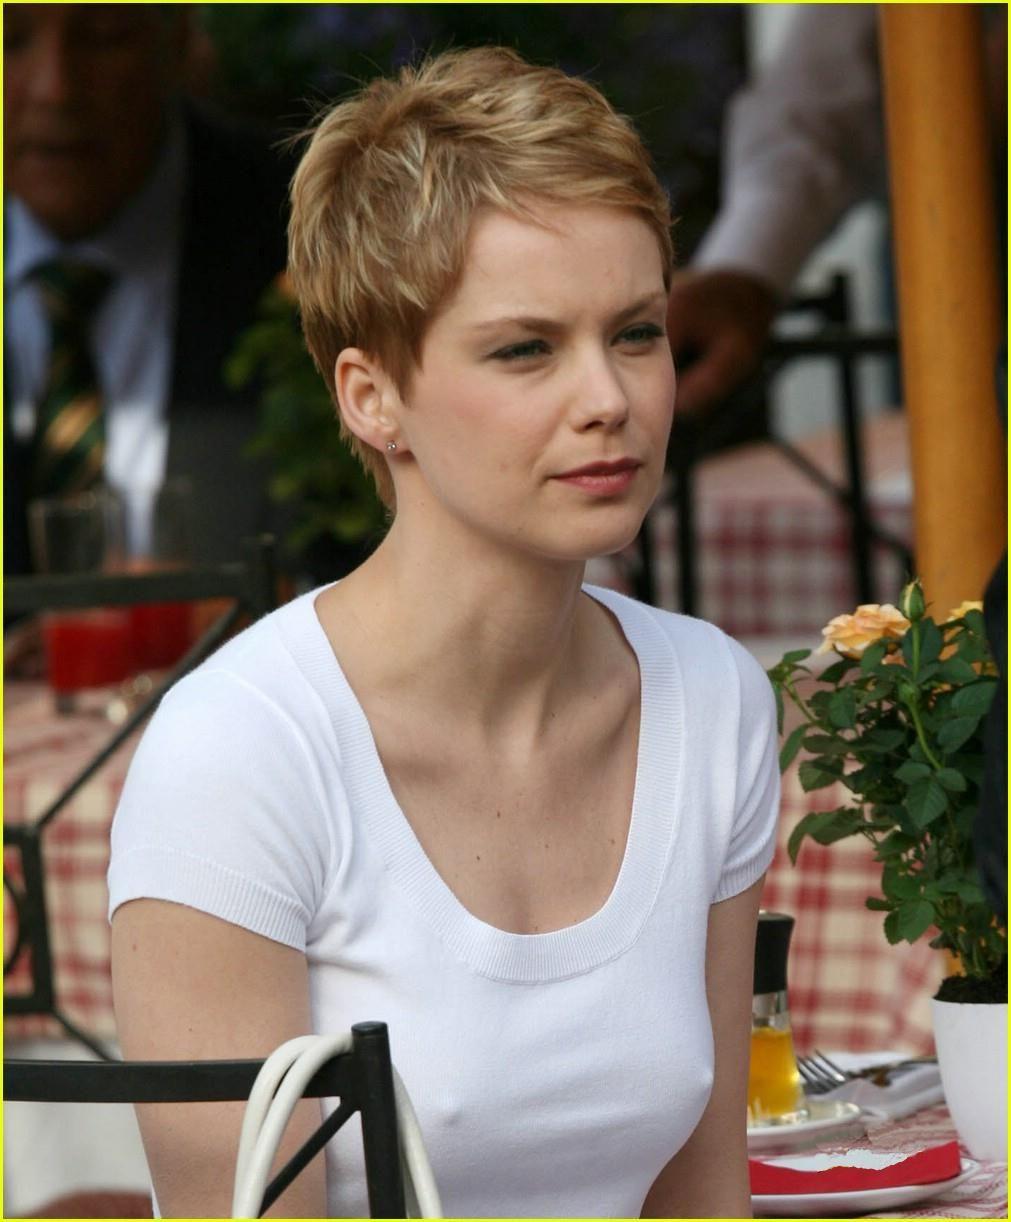 Andrea Osvart Hot Pics pin on beautiful hairstyles and makeup